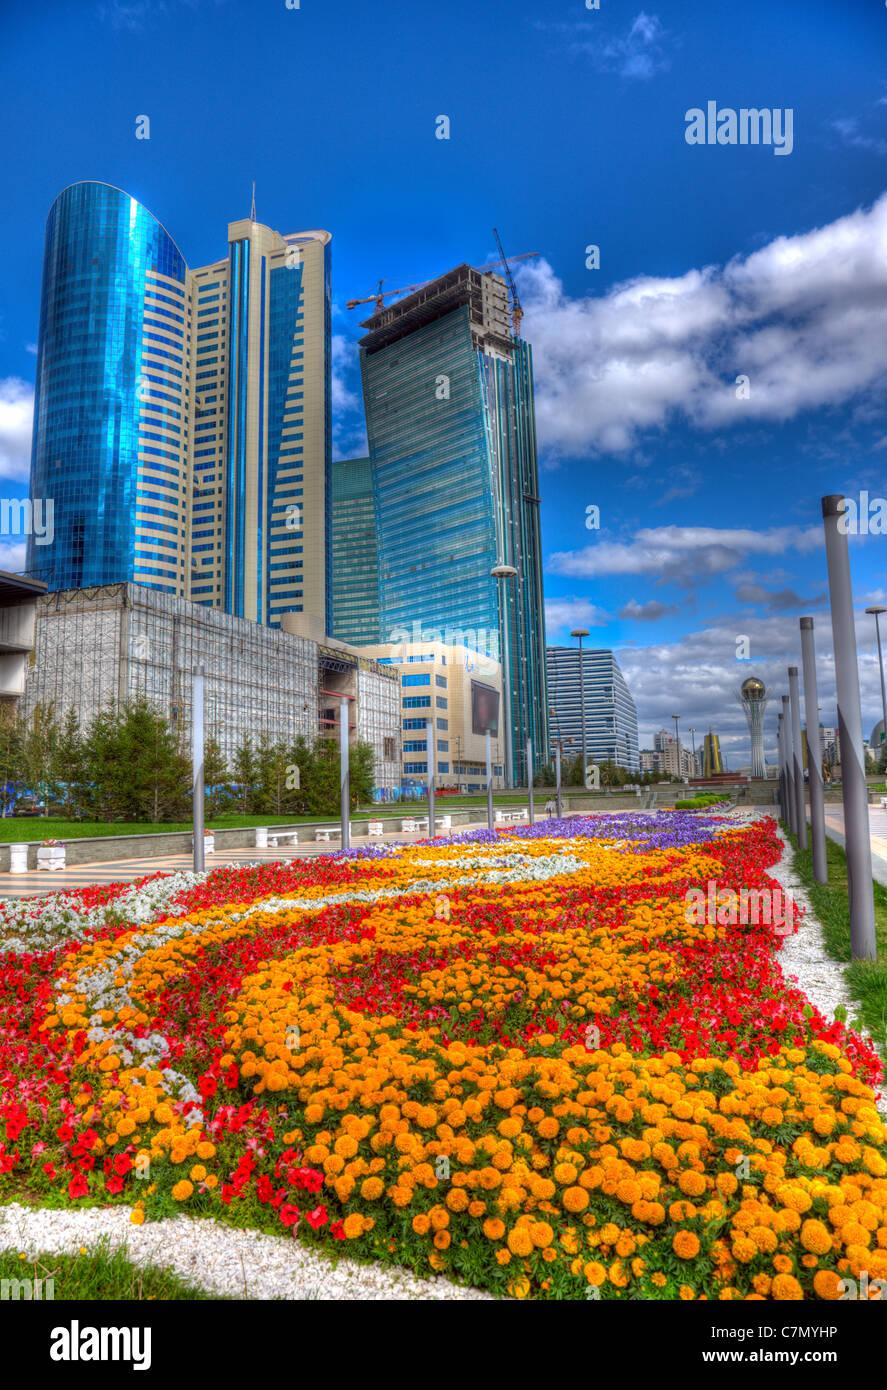 City landscape of Astana, Kazakhstan. HDR image. - Stock Image